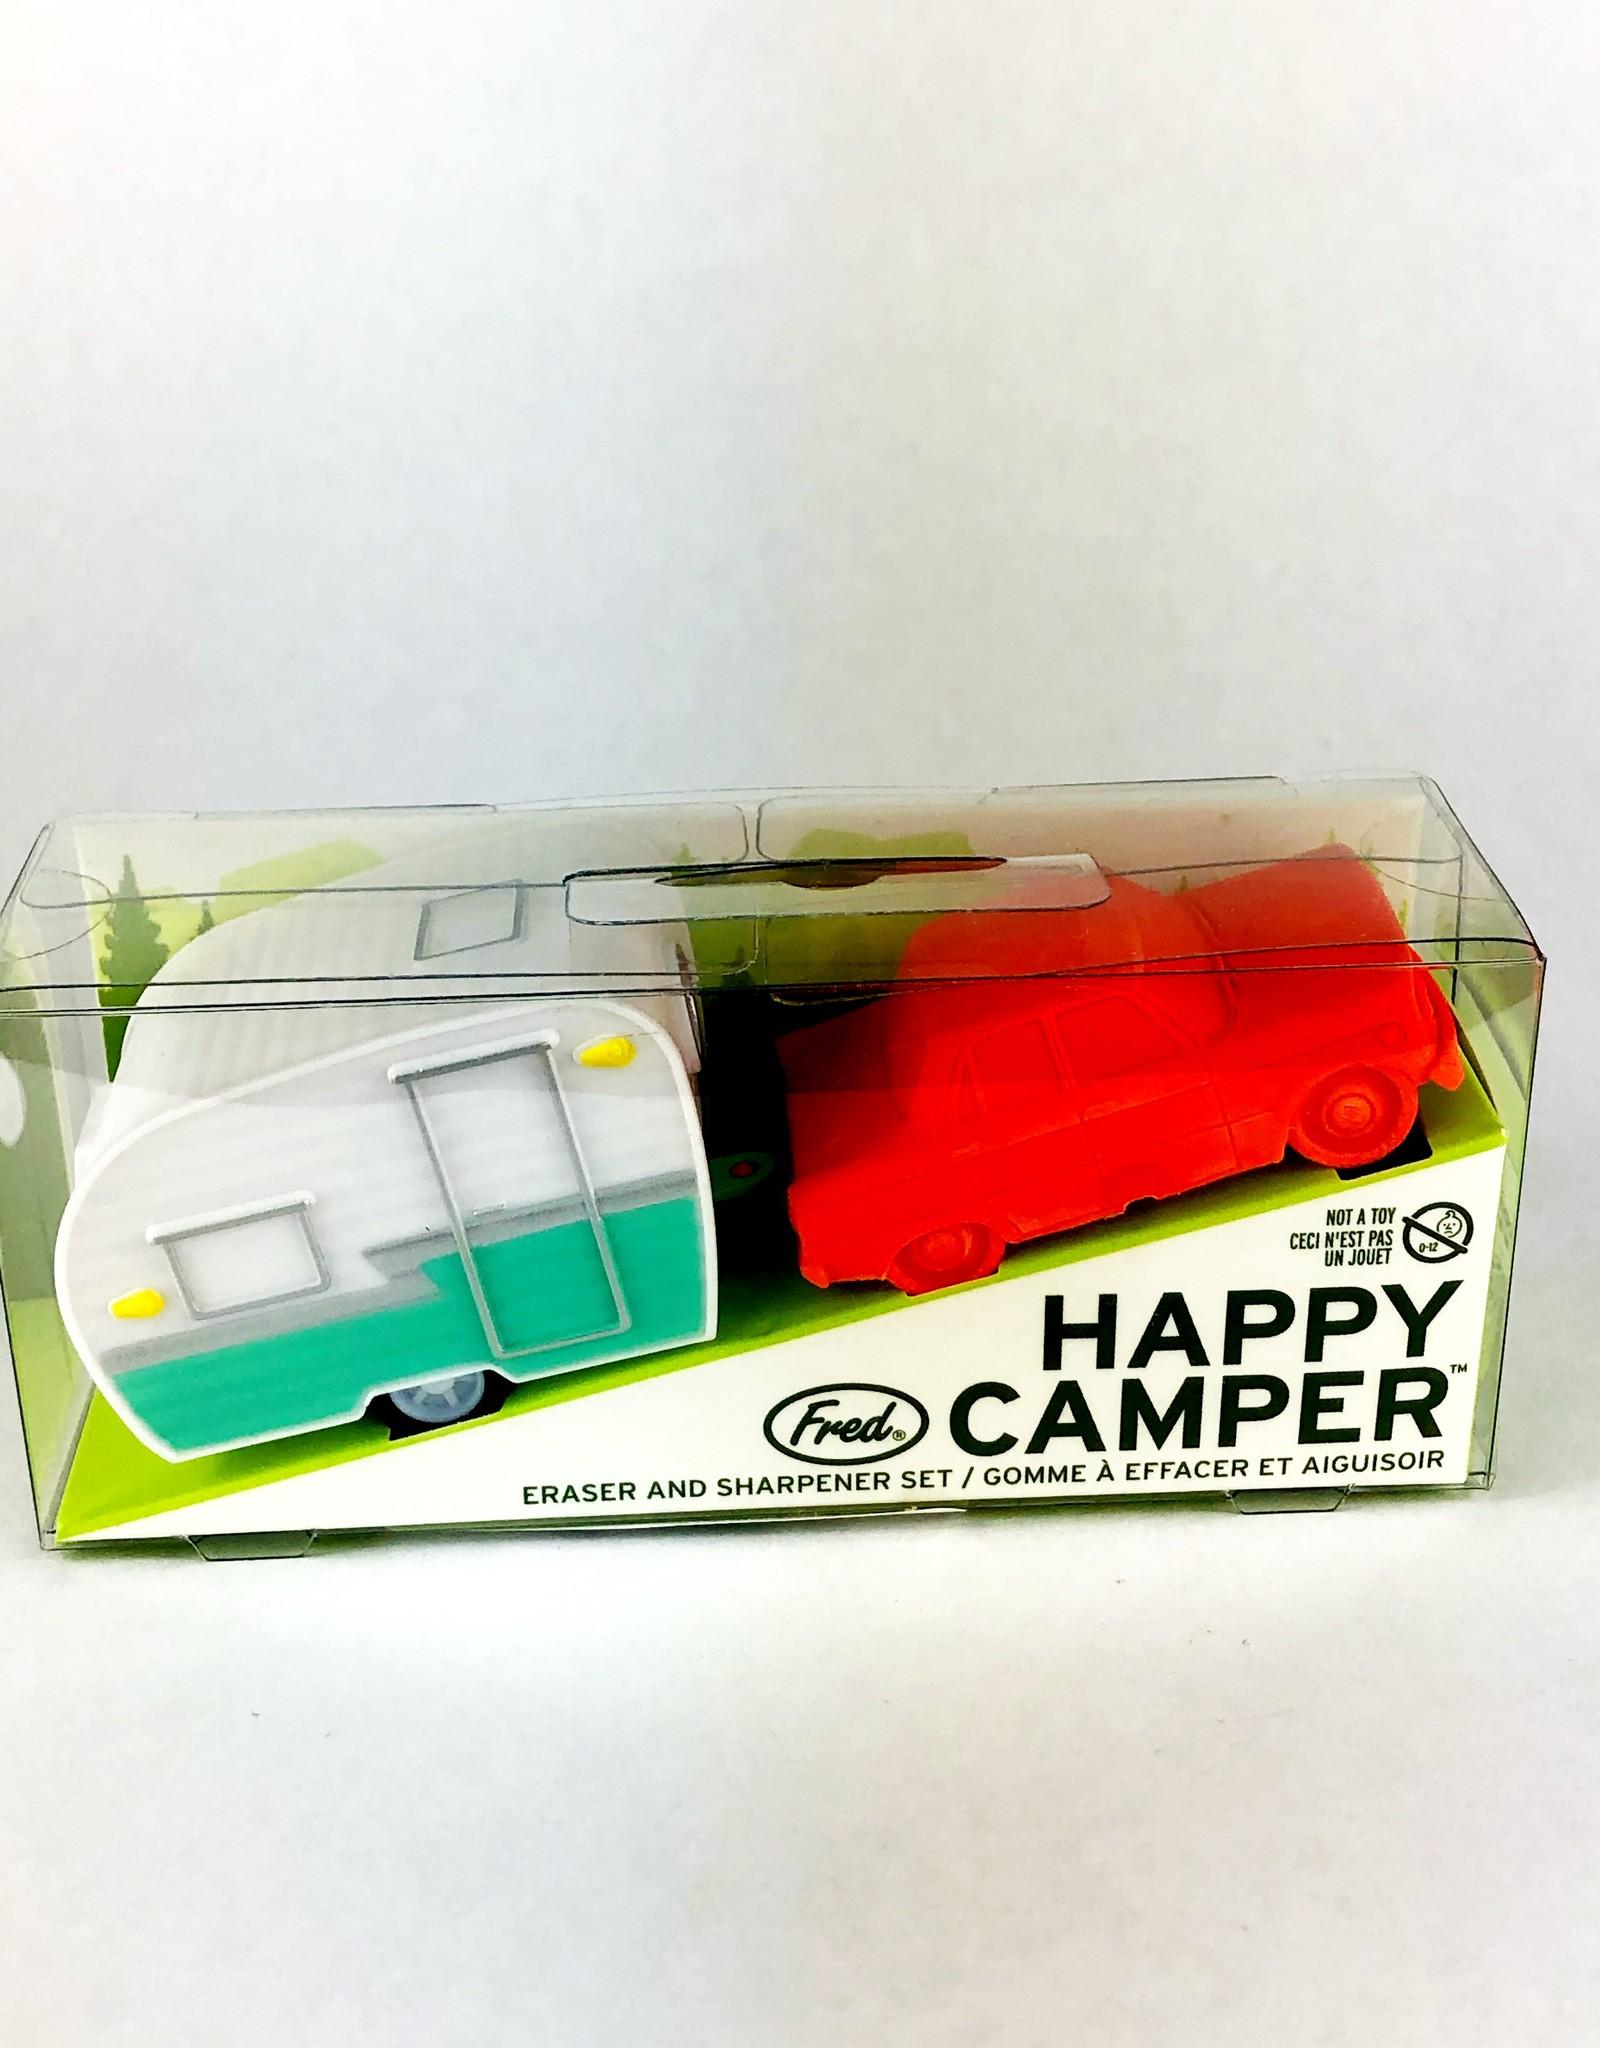 Fred & Friends HAPPY CAMPER - ERASER + SHARPENER